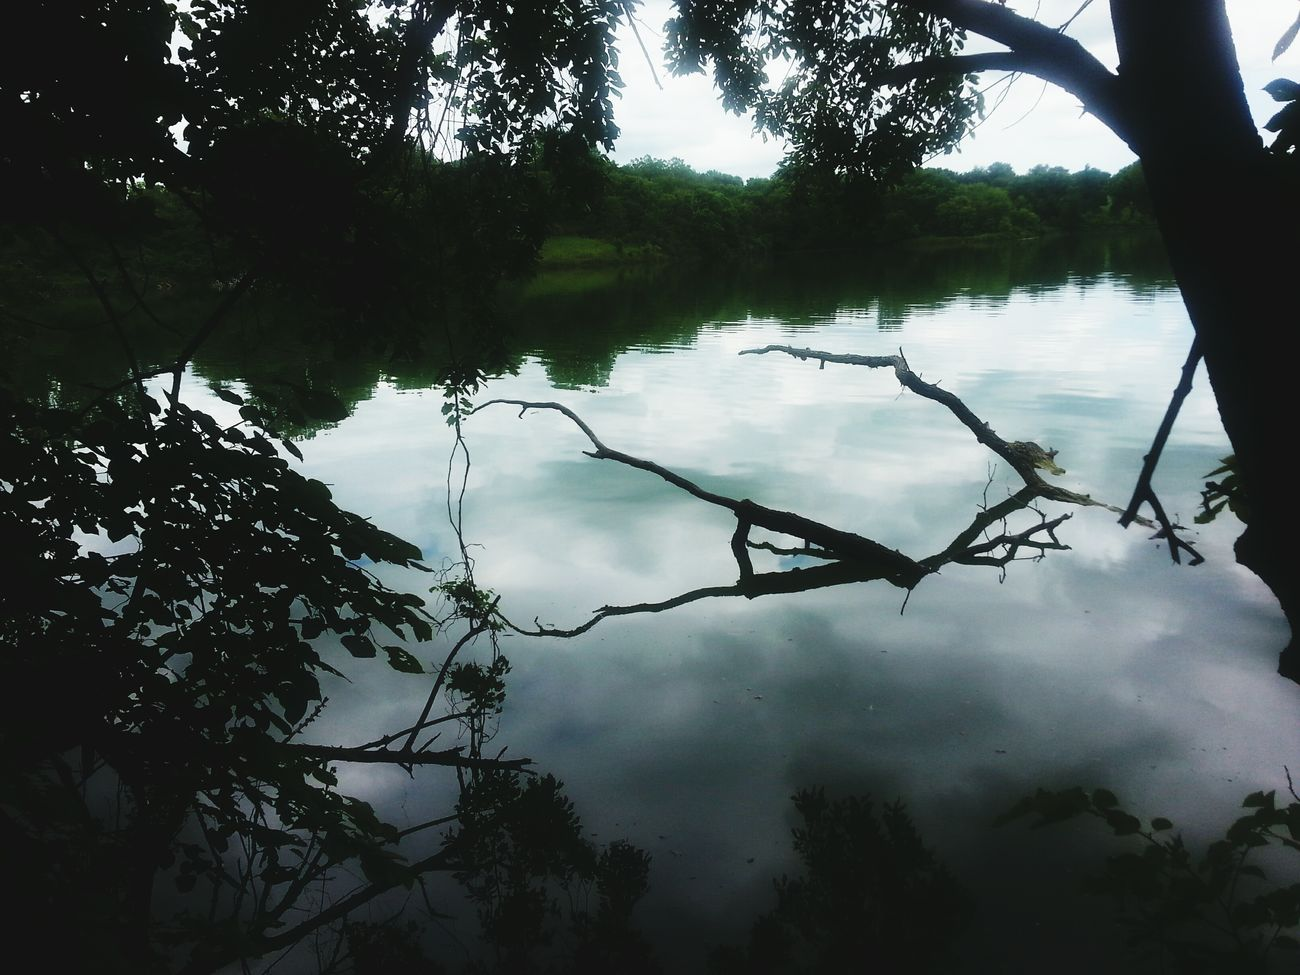 Taking Photos Reflections Deadwood  Fishing